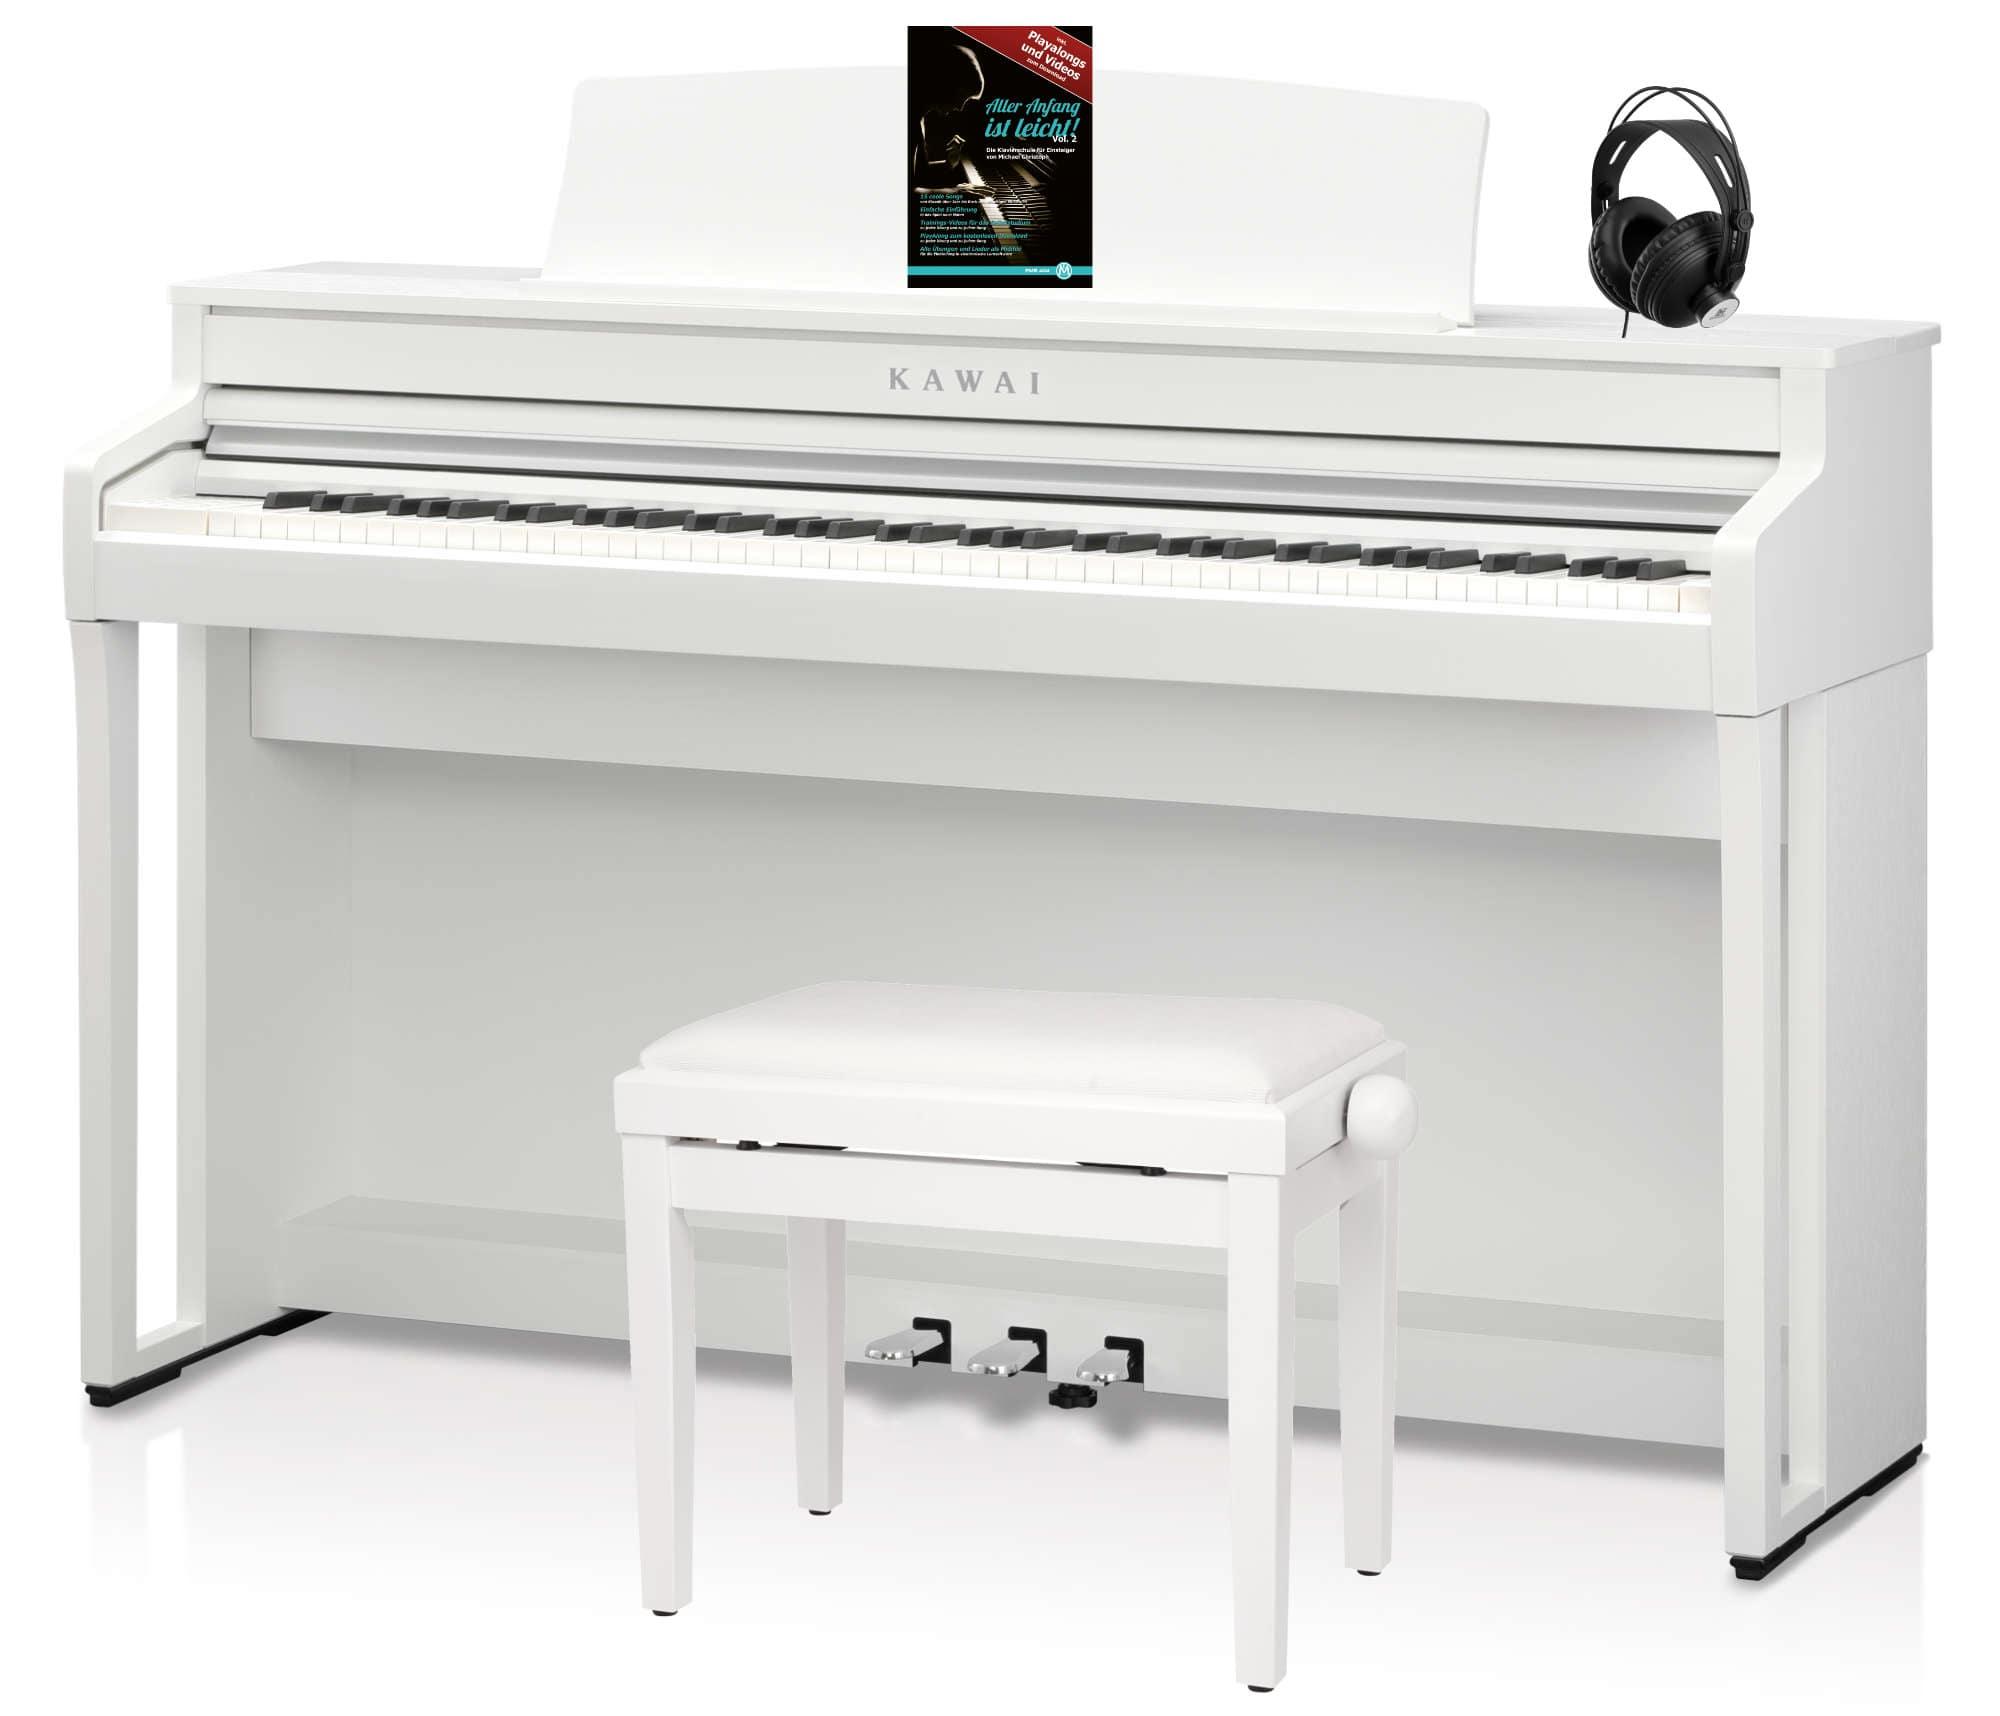 Digitalpianos - Kawai CA 59 W Digitalpiano Set Weiß - Onlineshop Musikhaus Kirstein